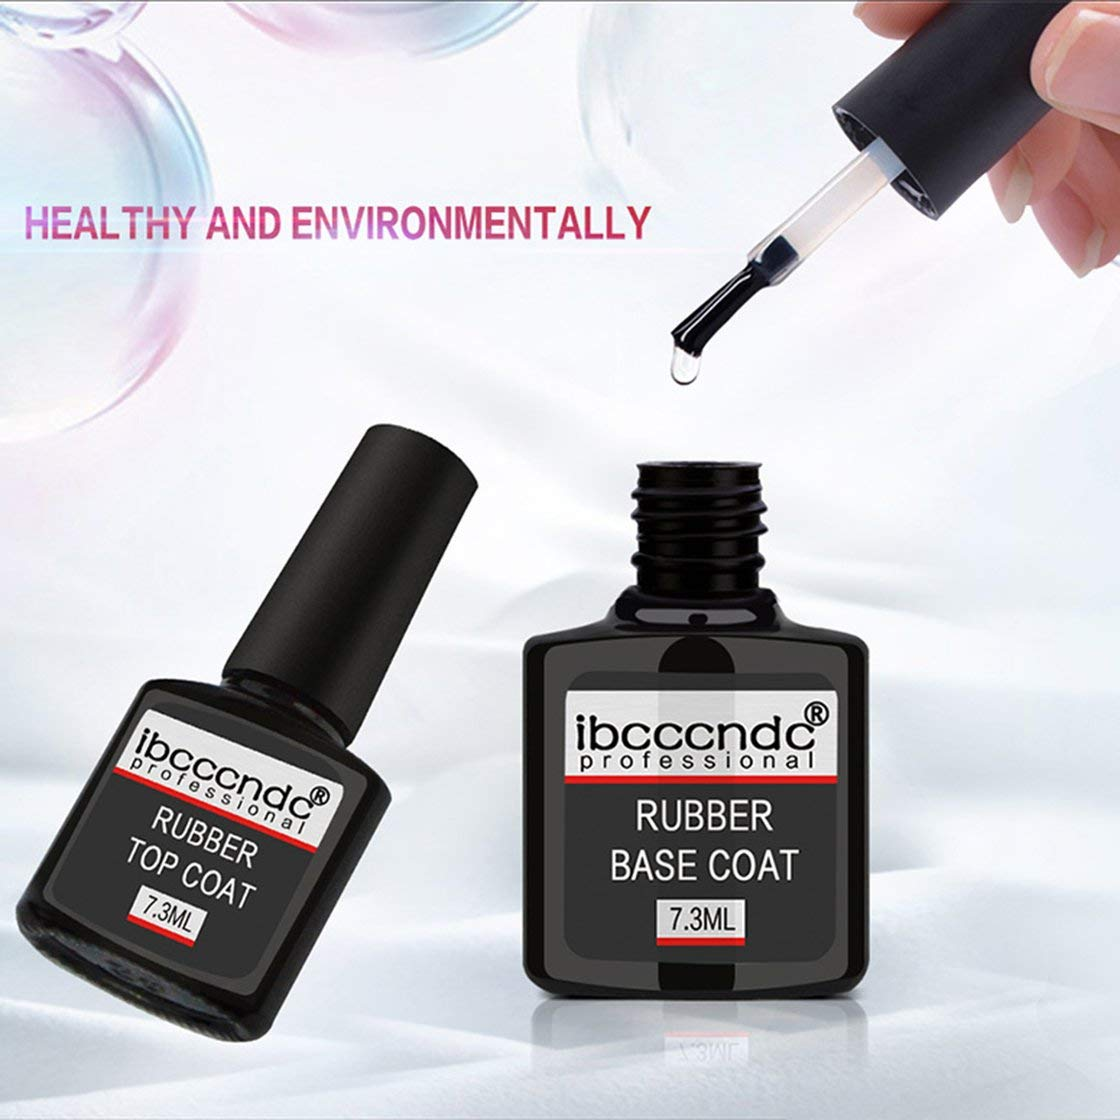 7 3 Ml Professional Rubber Base Coat Gummi Top Coat Soak Off Gel